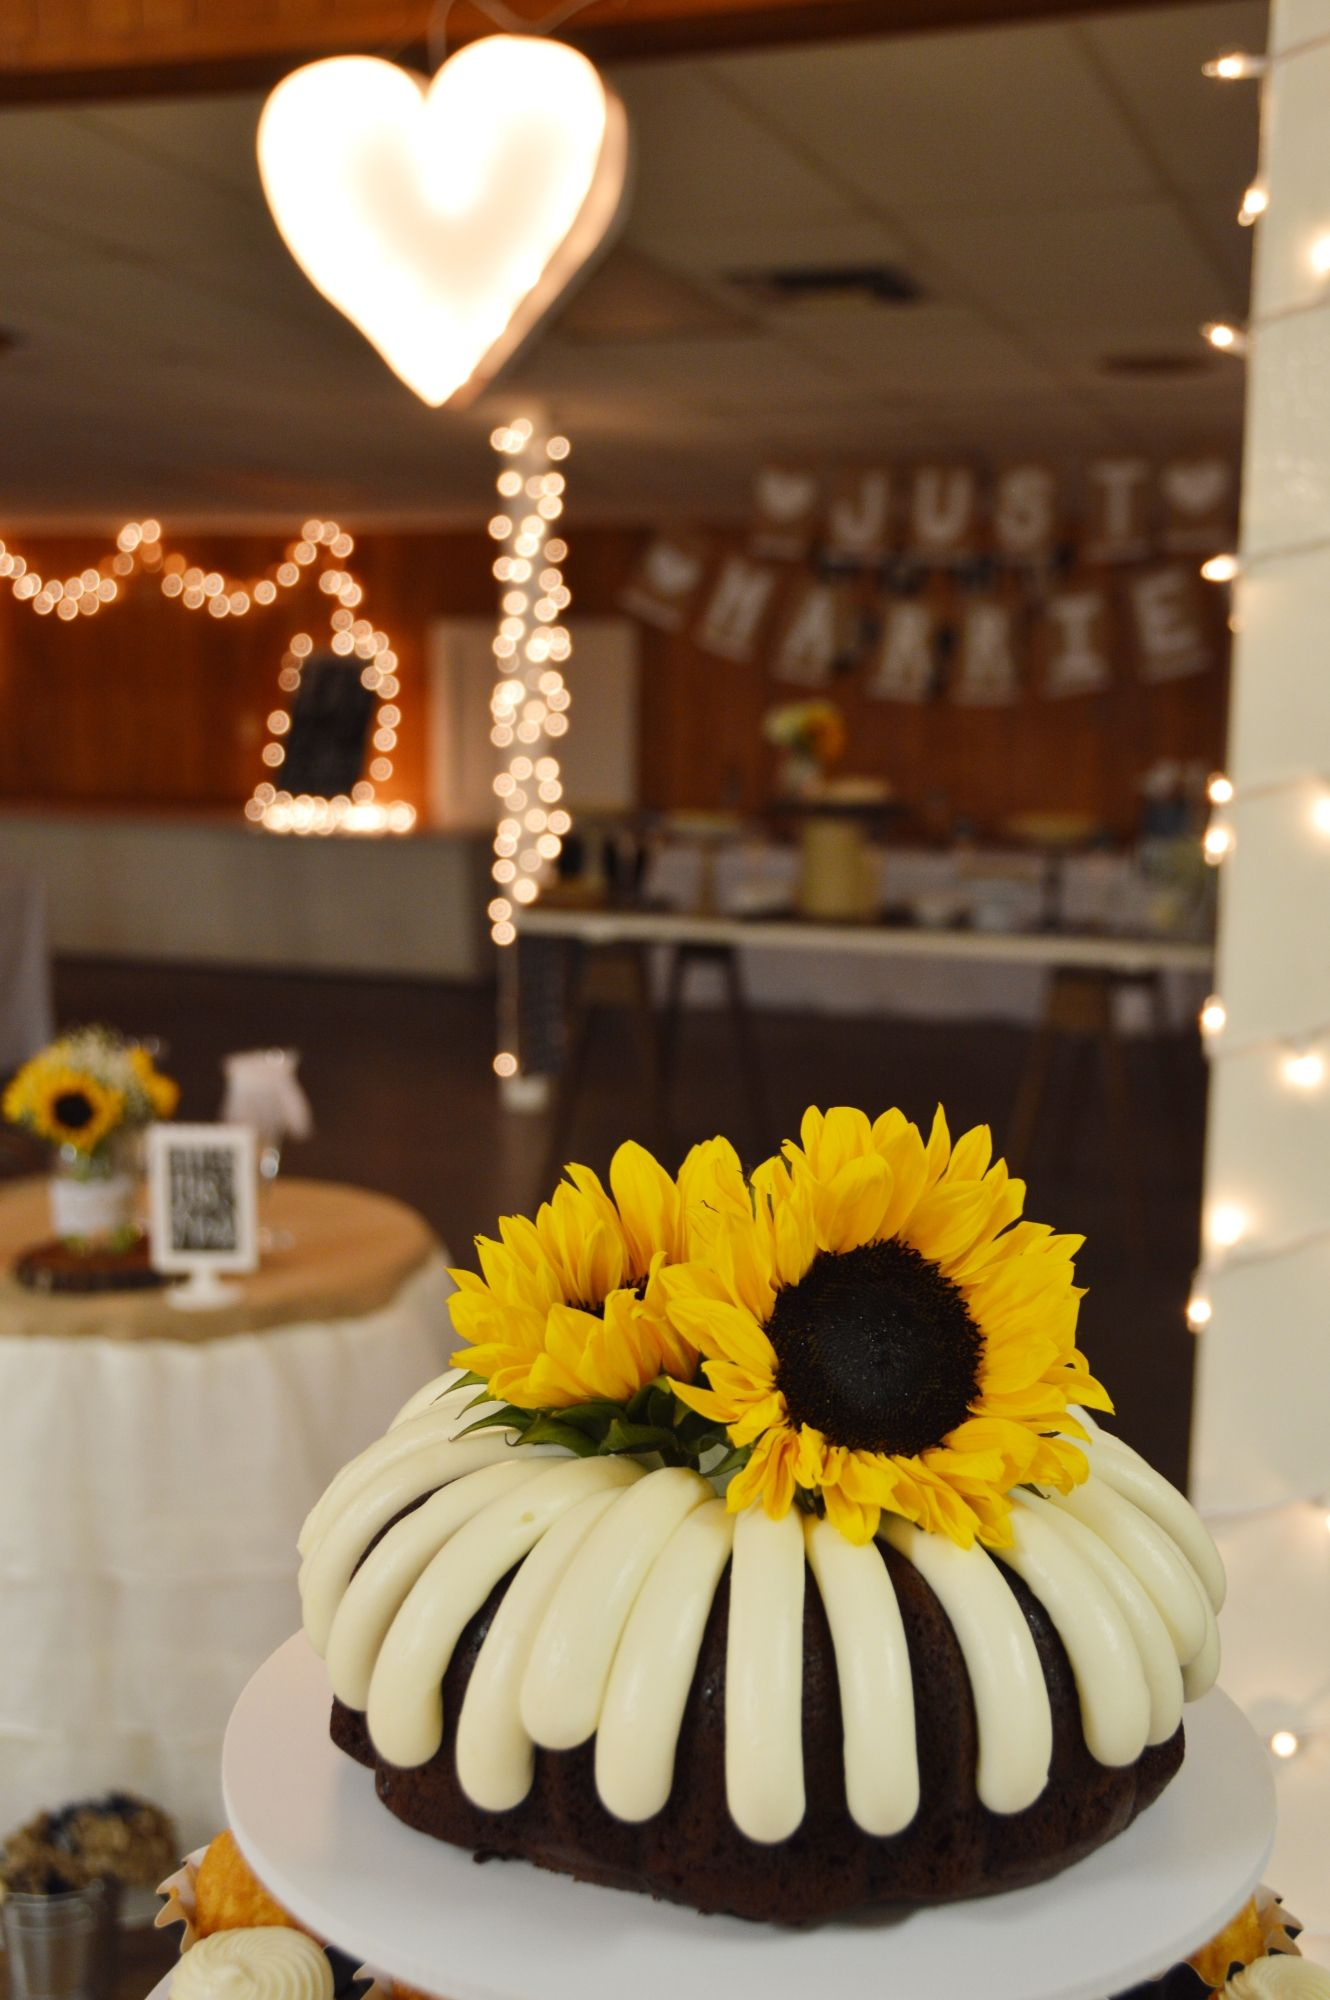 Sunflower Cake topper & Marquee heart light in background ...